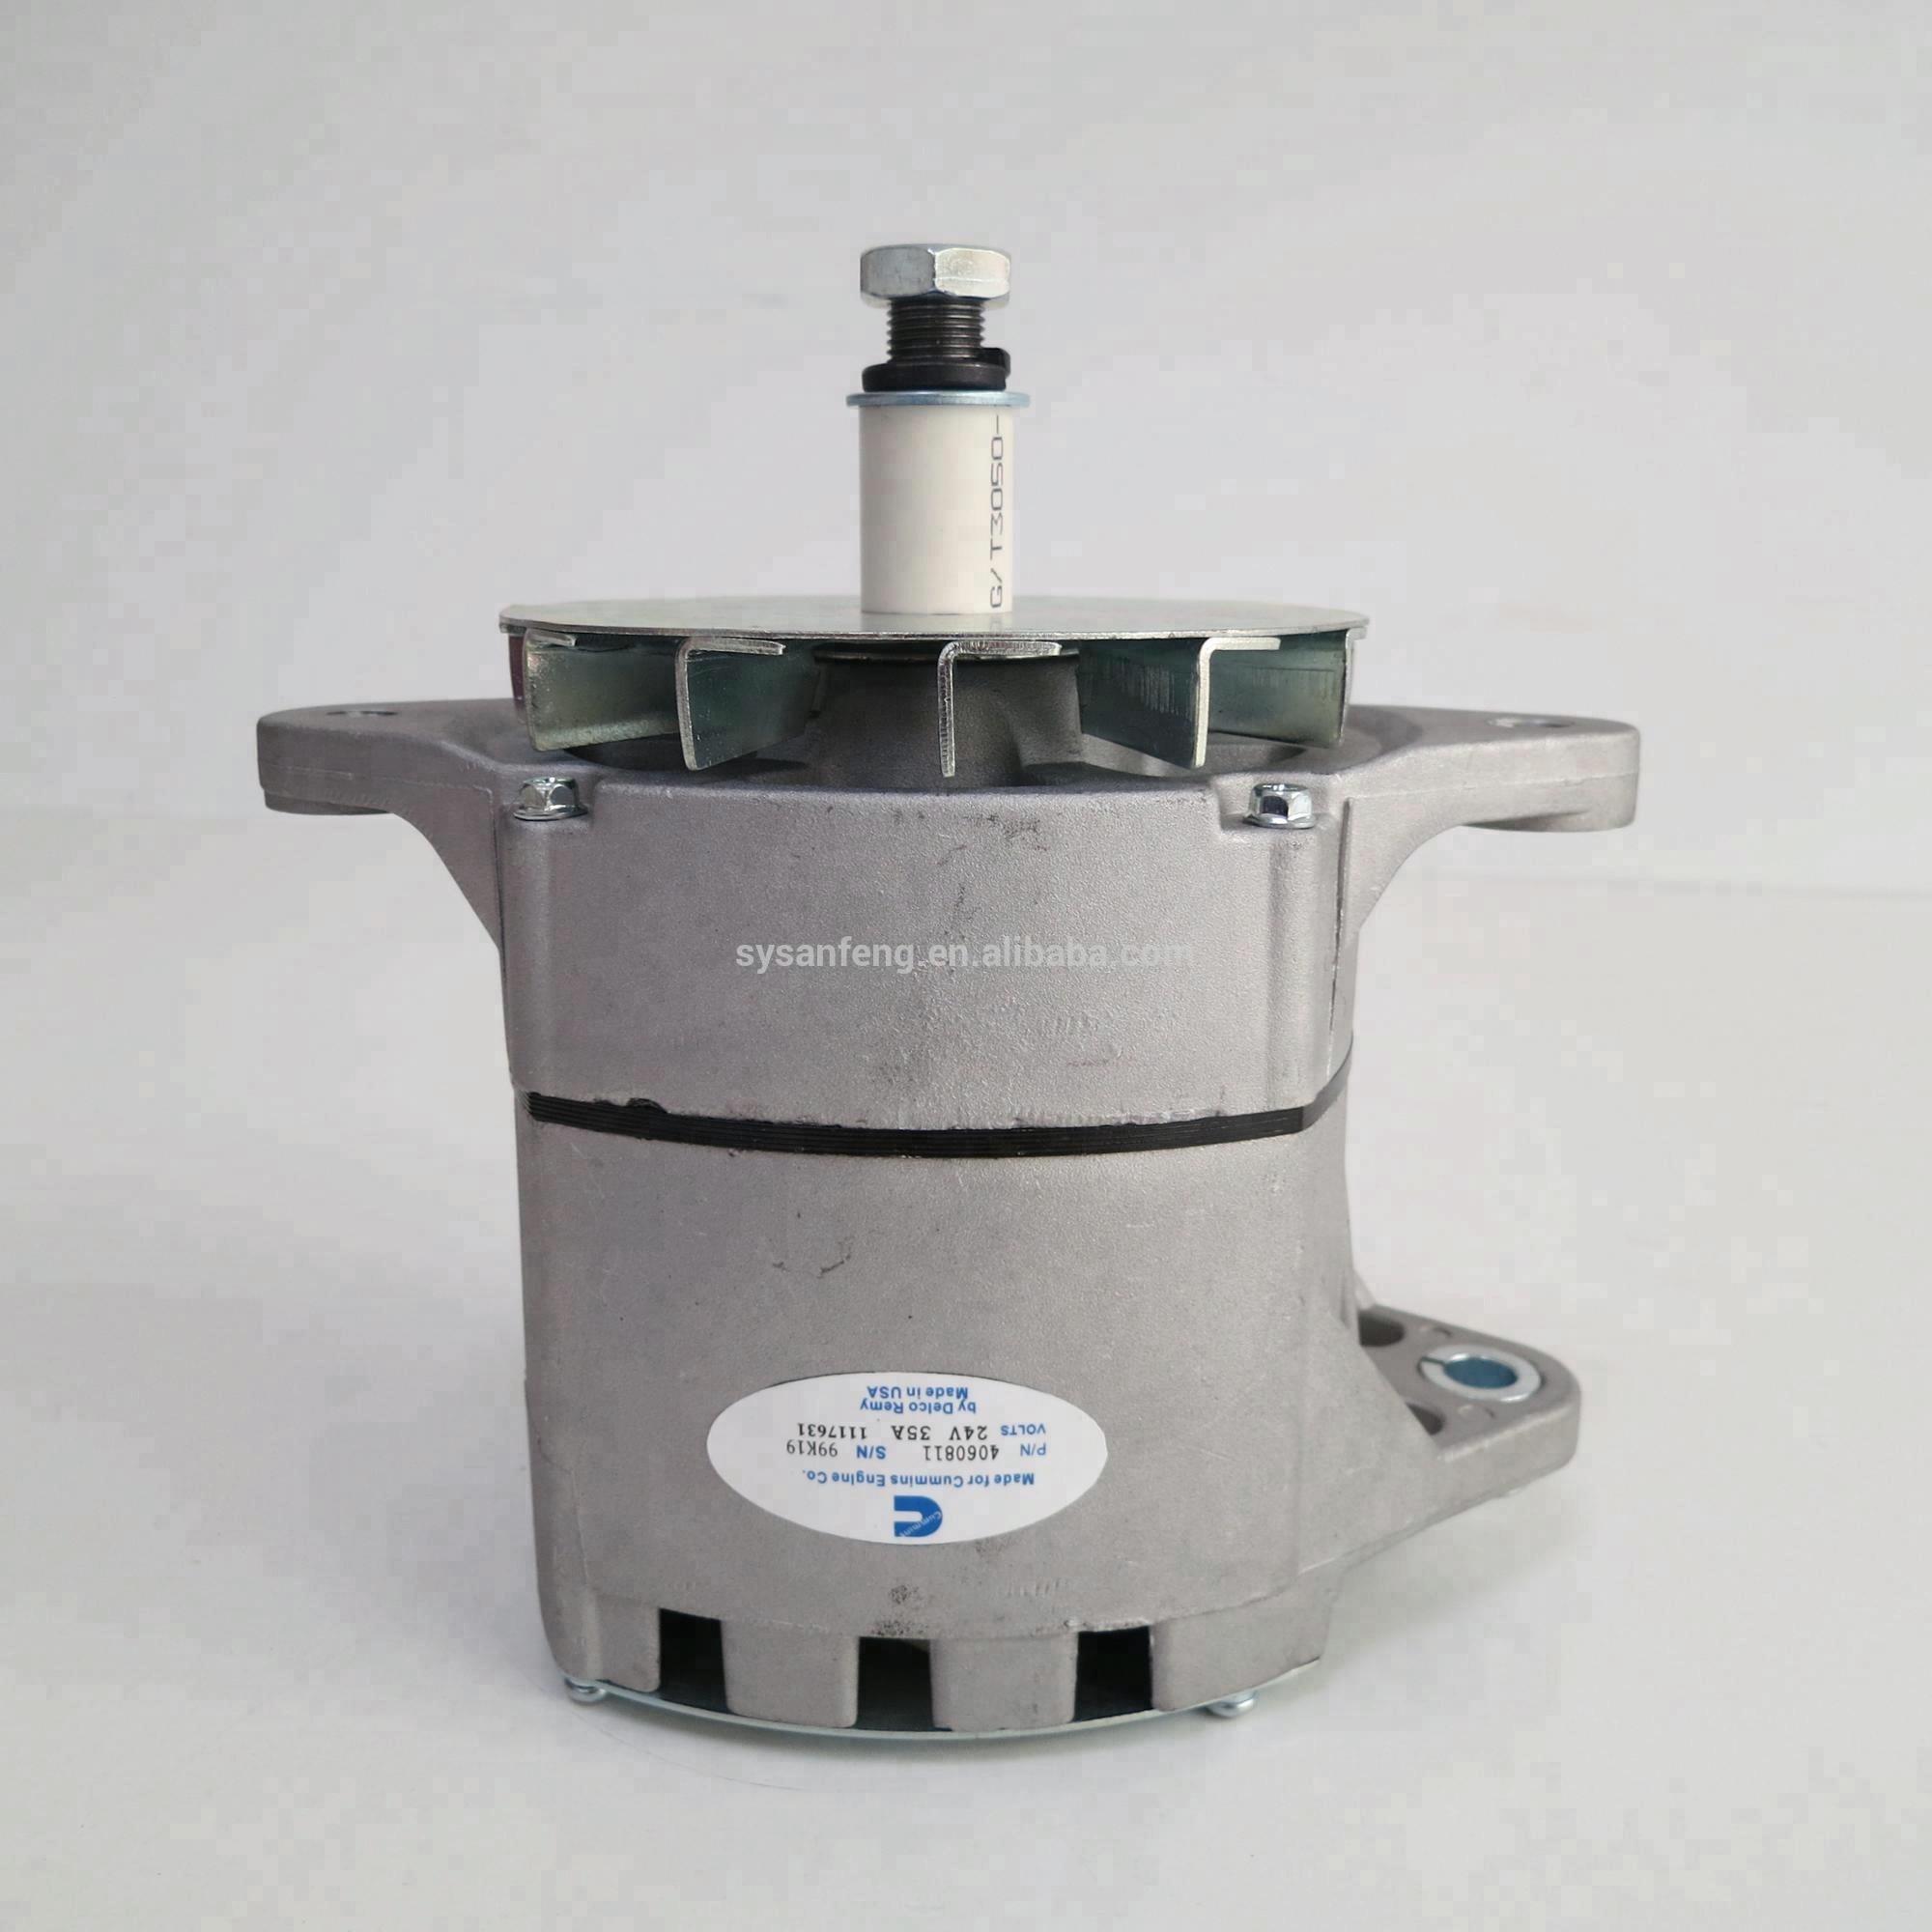 Diesel Engine Spare Parts Alternator 4060811 - Buy Alternator,Car  Alternnator,4060811 Alternator Parts Product on Alibaba com